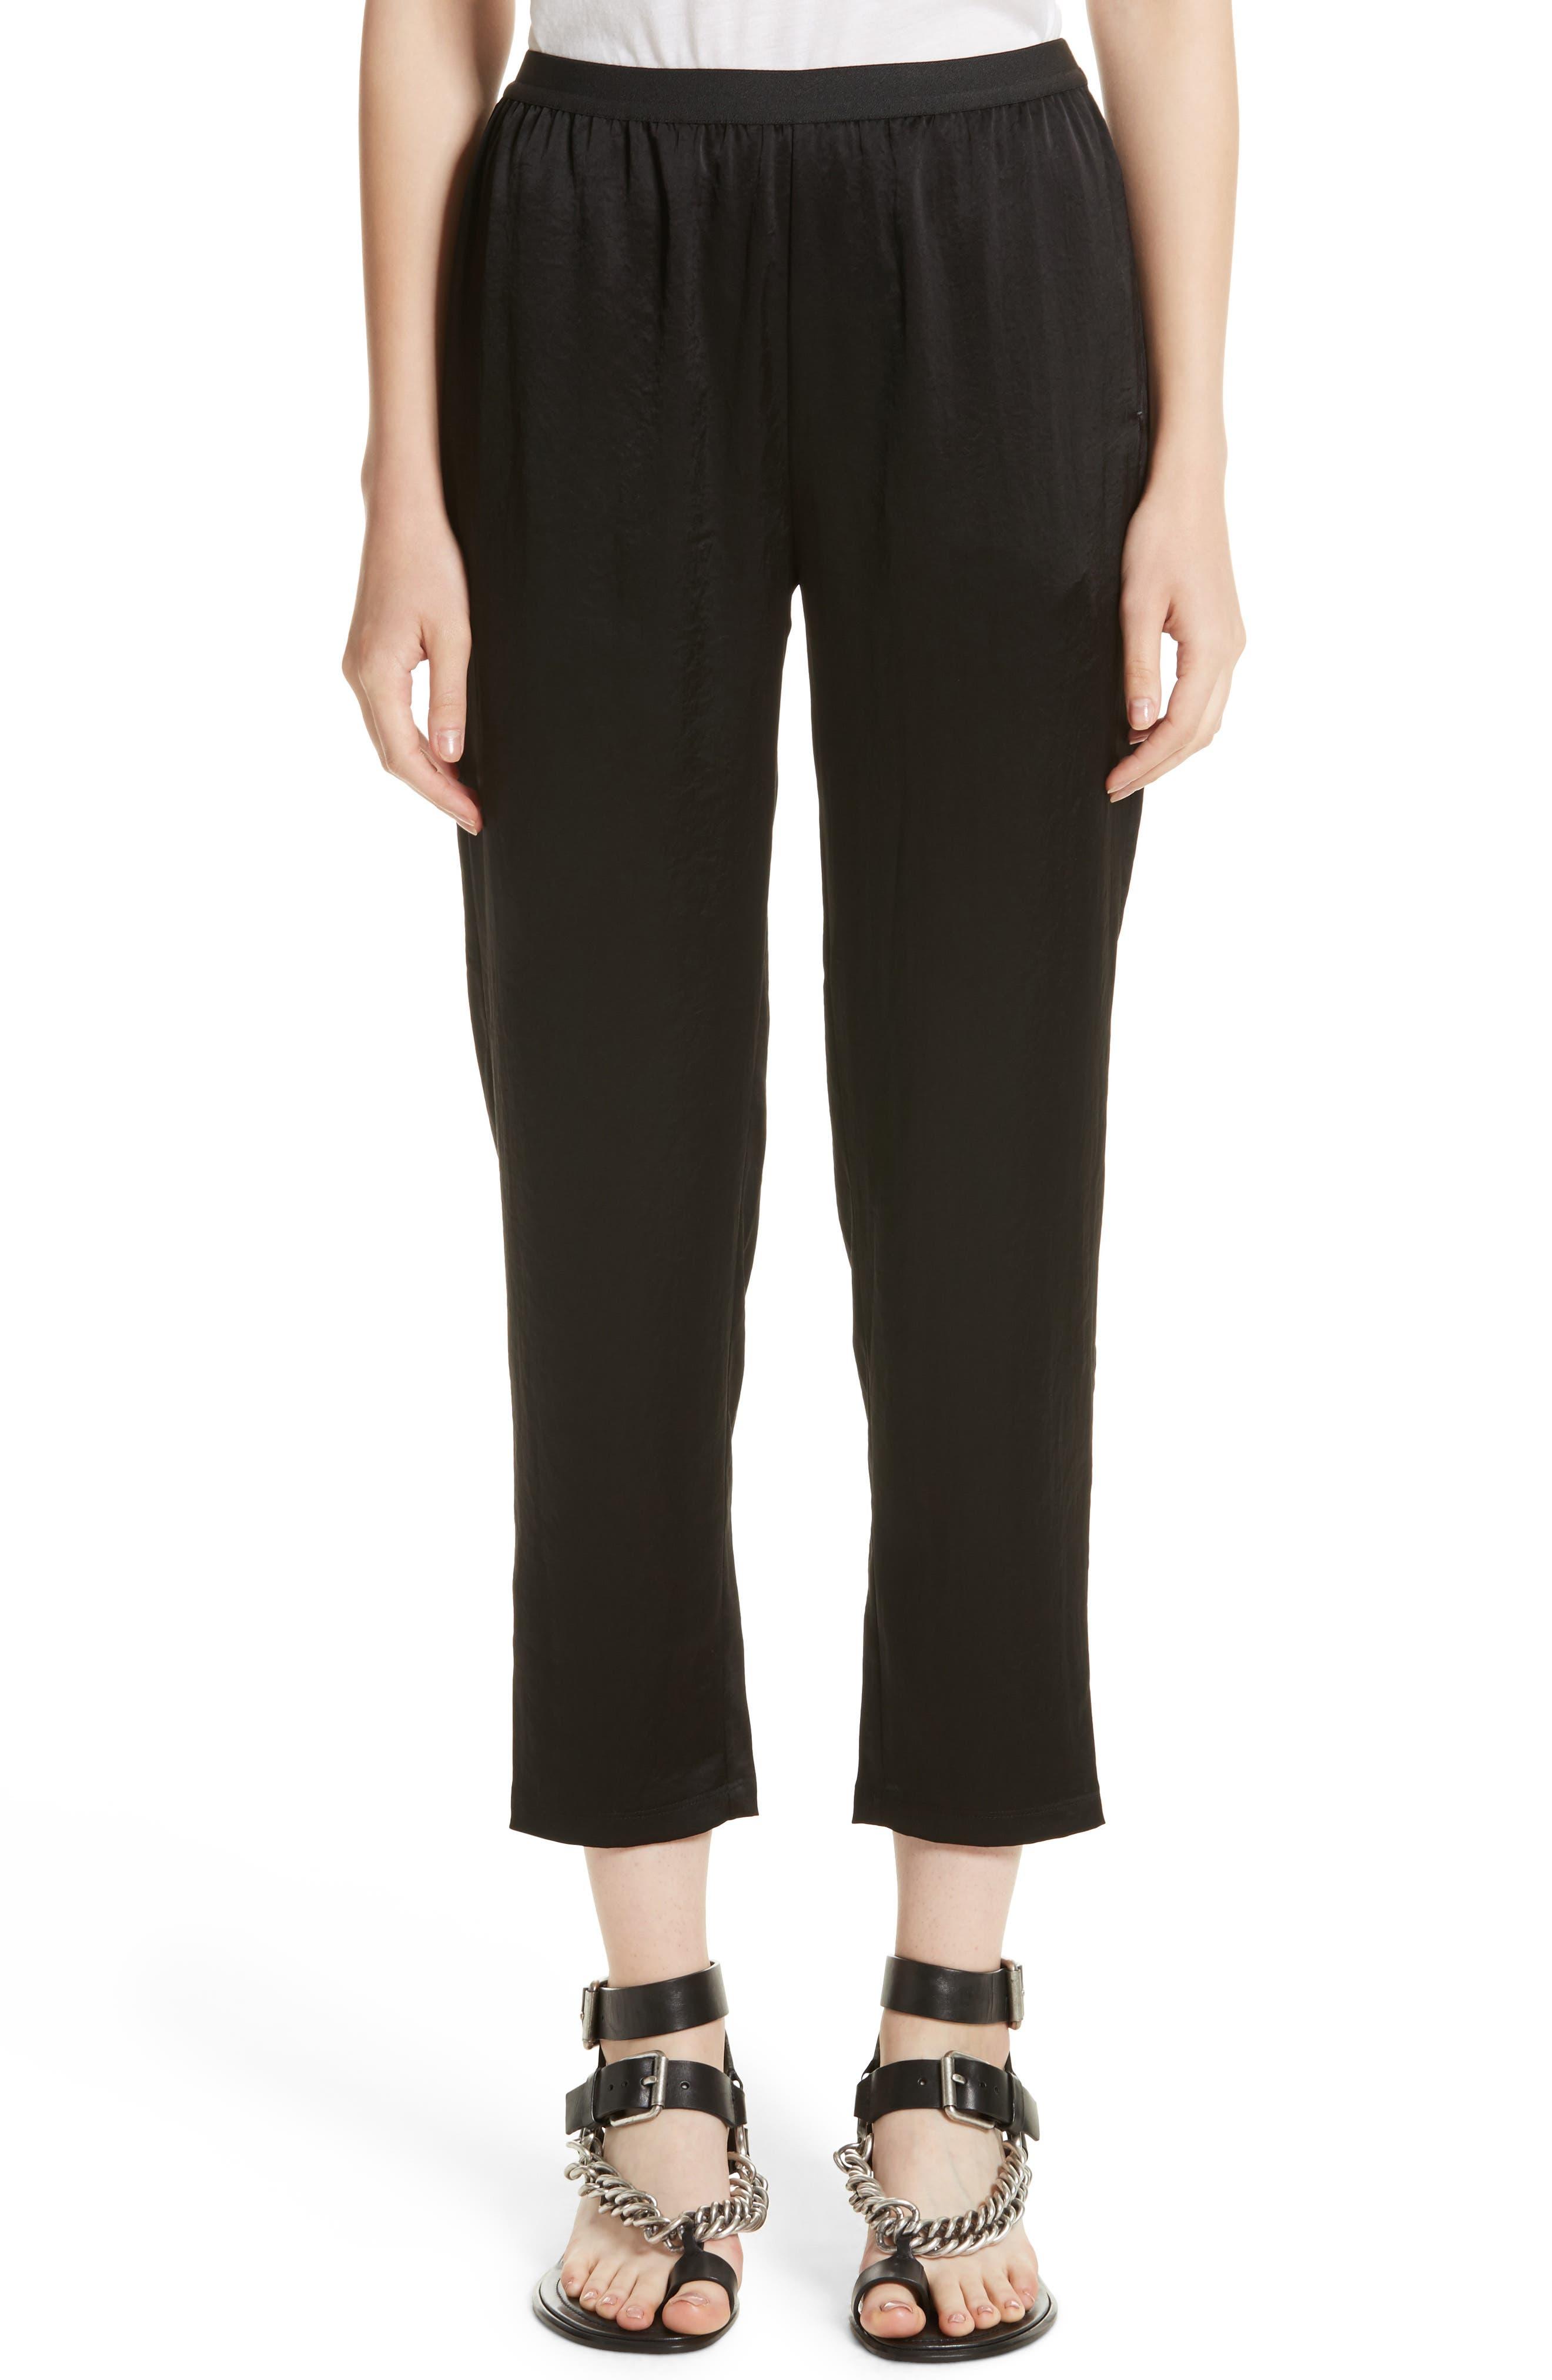 Wash N Go Woven Pants,                         Main,                         color, Black